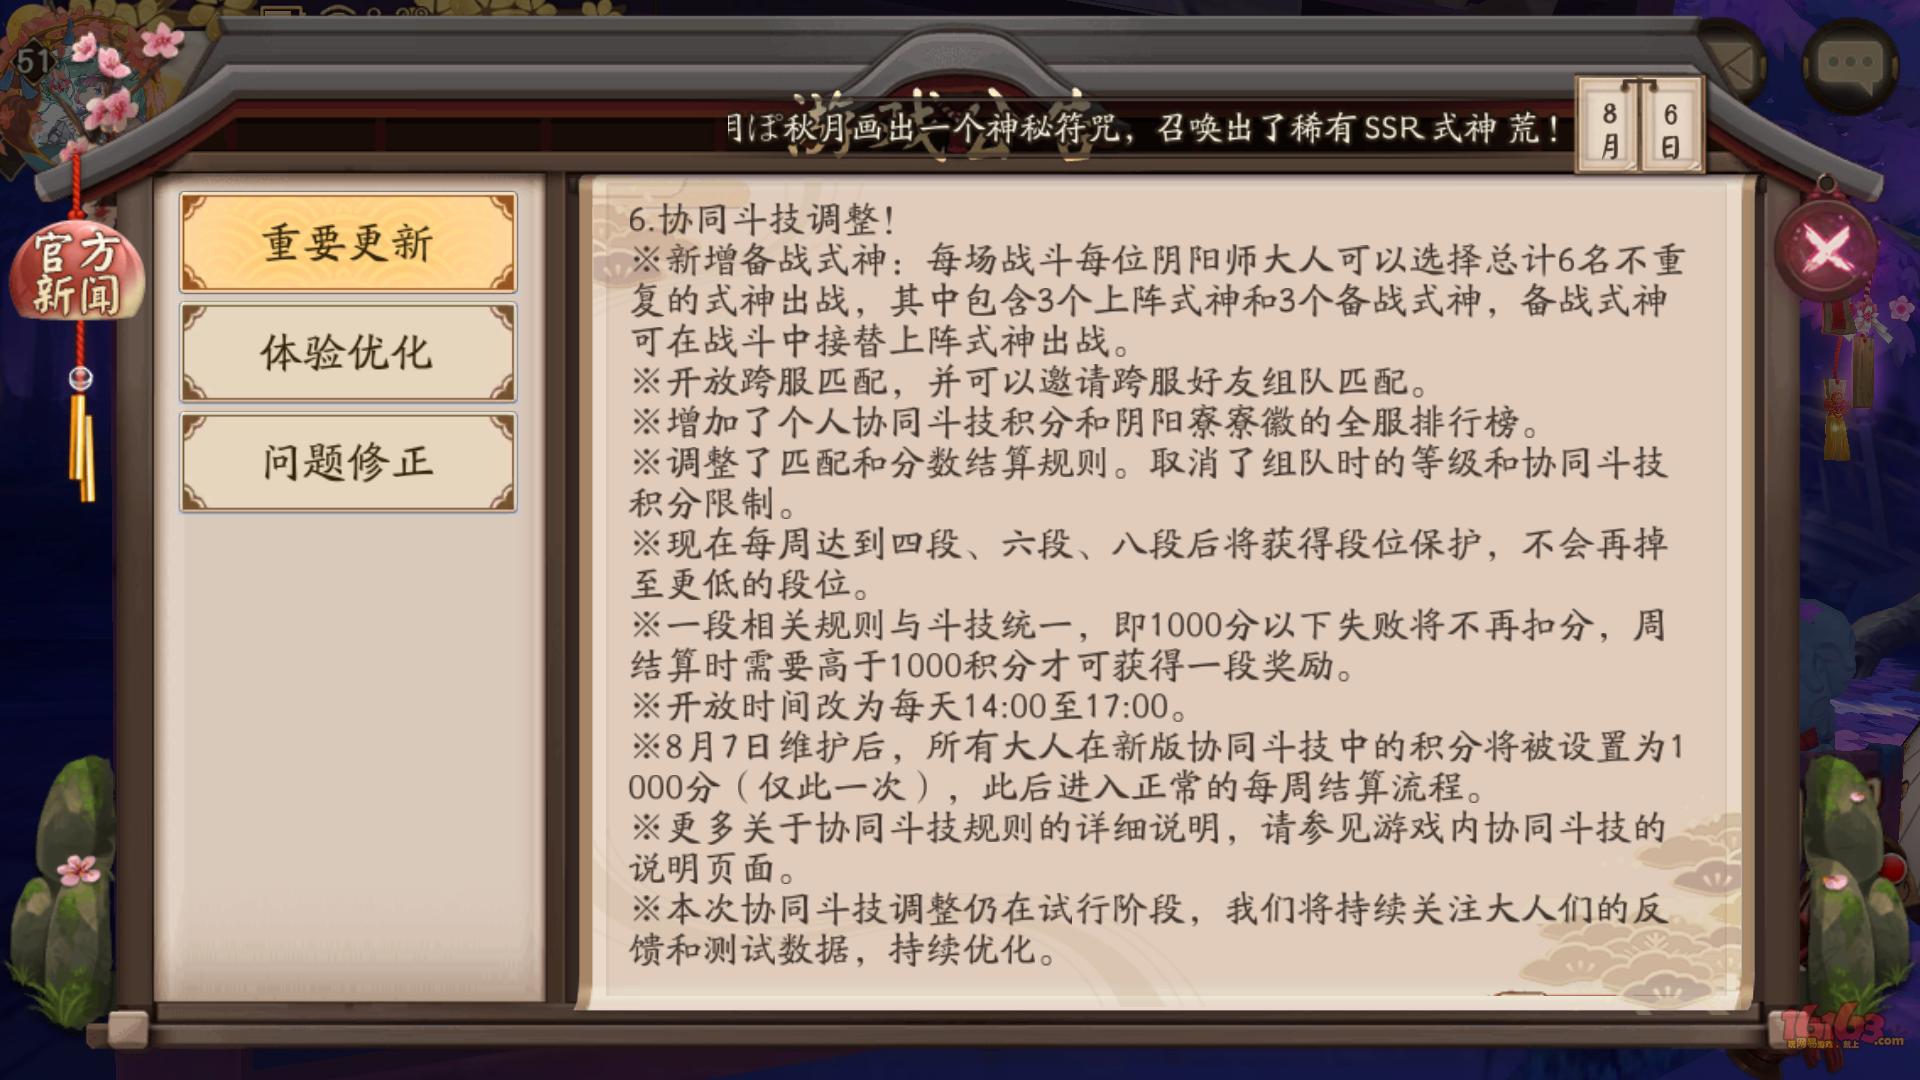 Screenshot_2019-08-12-08-28-47-583_com.netease.onmyoji.png